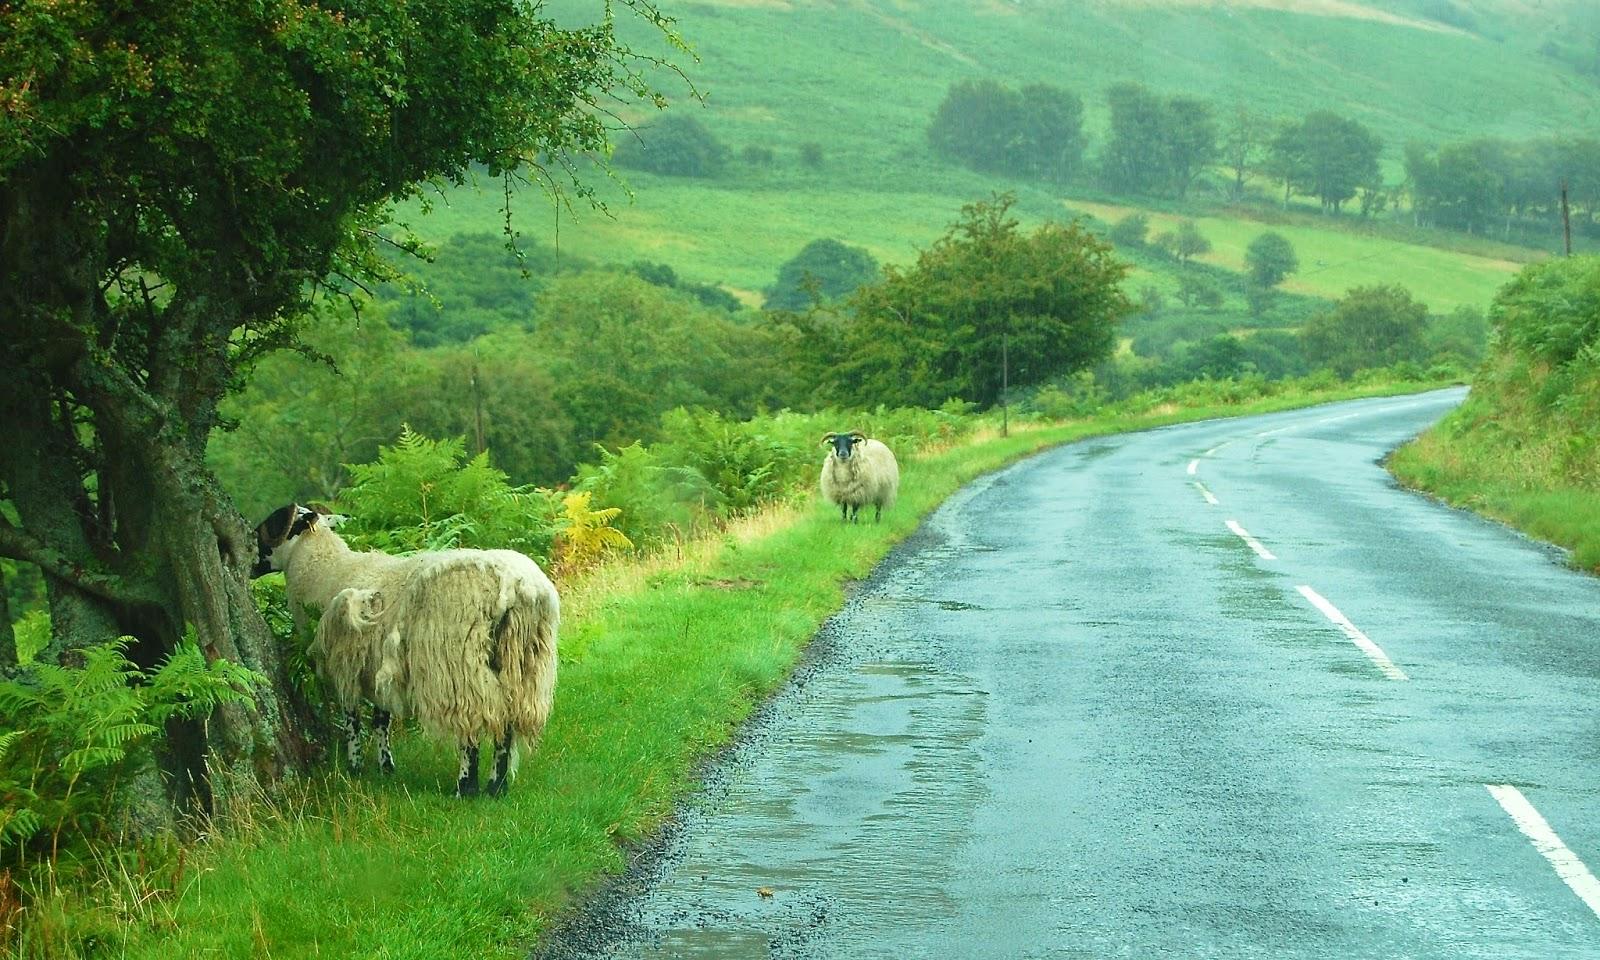 Roadside sheep on the Isle of Arran